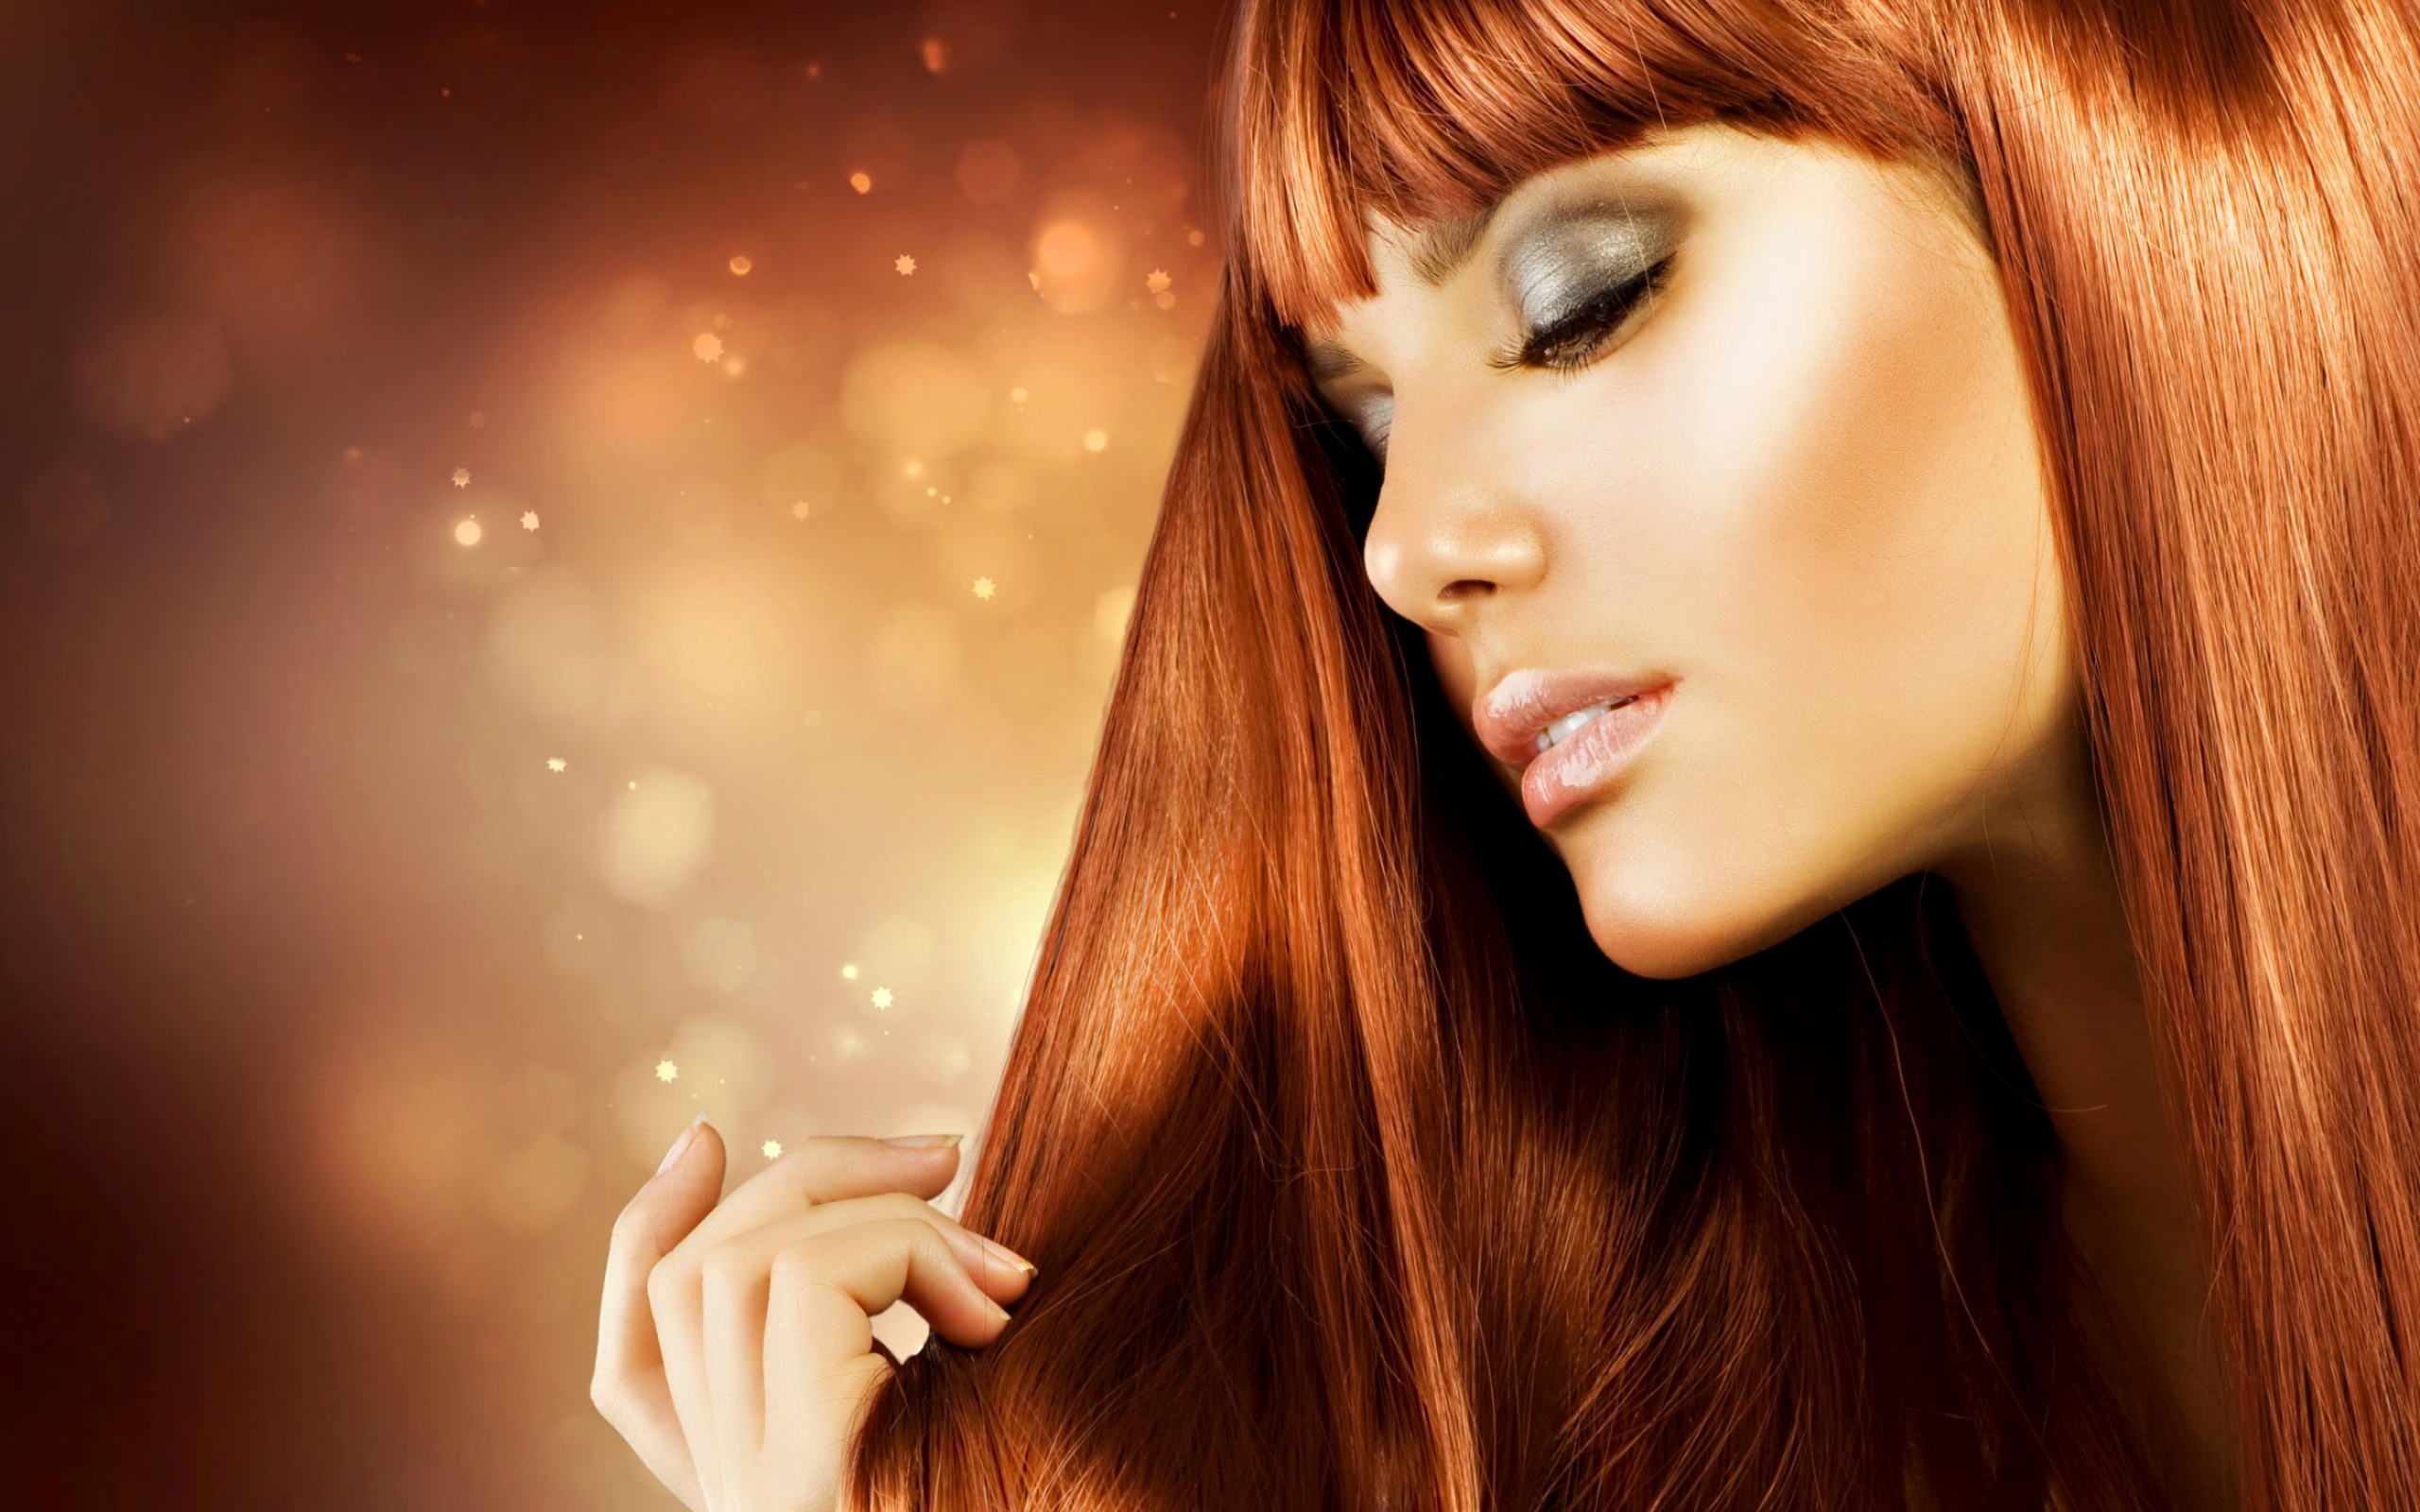 Hair salon girl #9